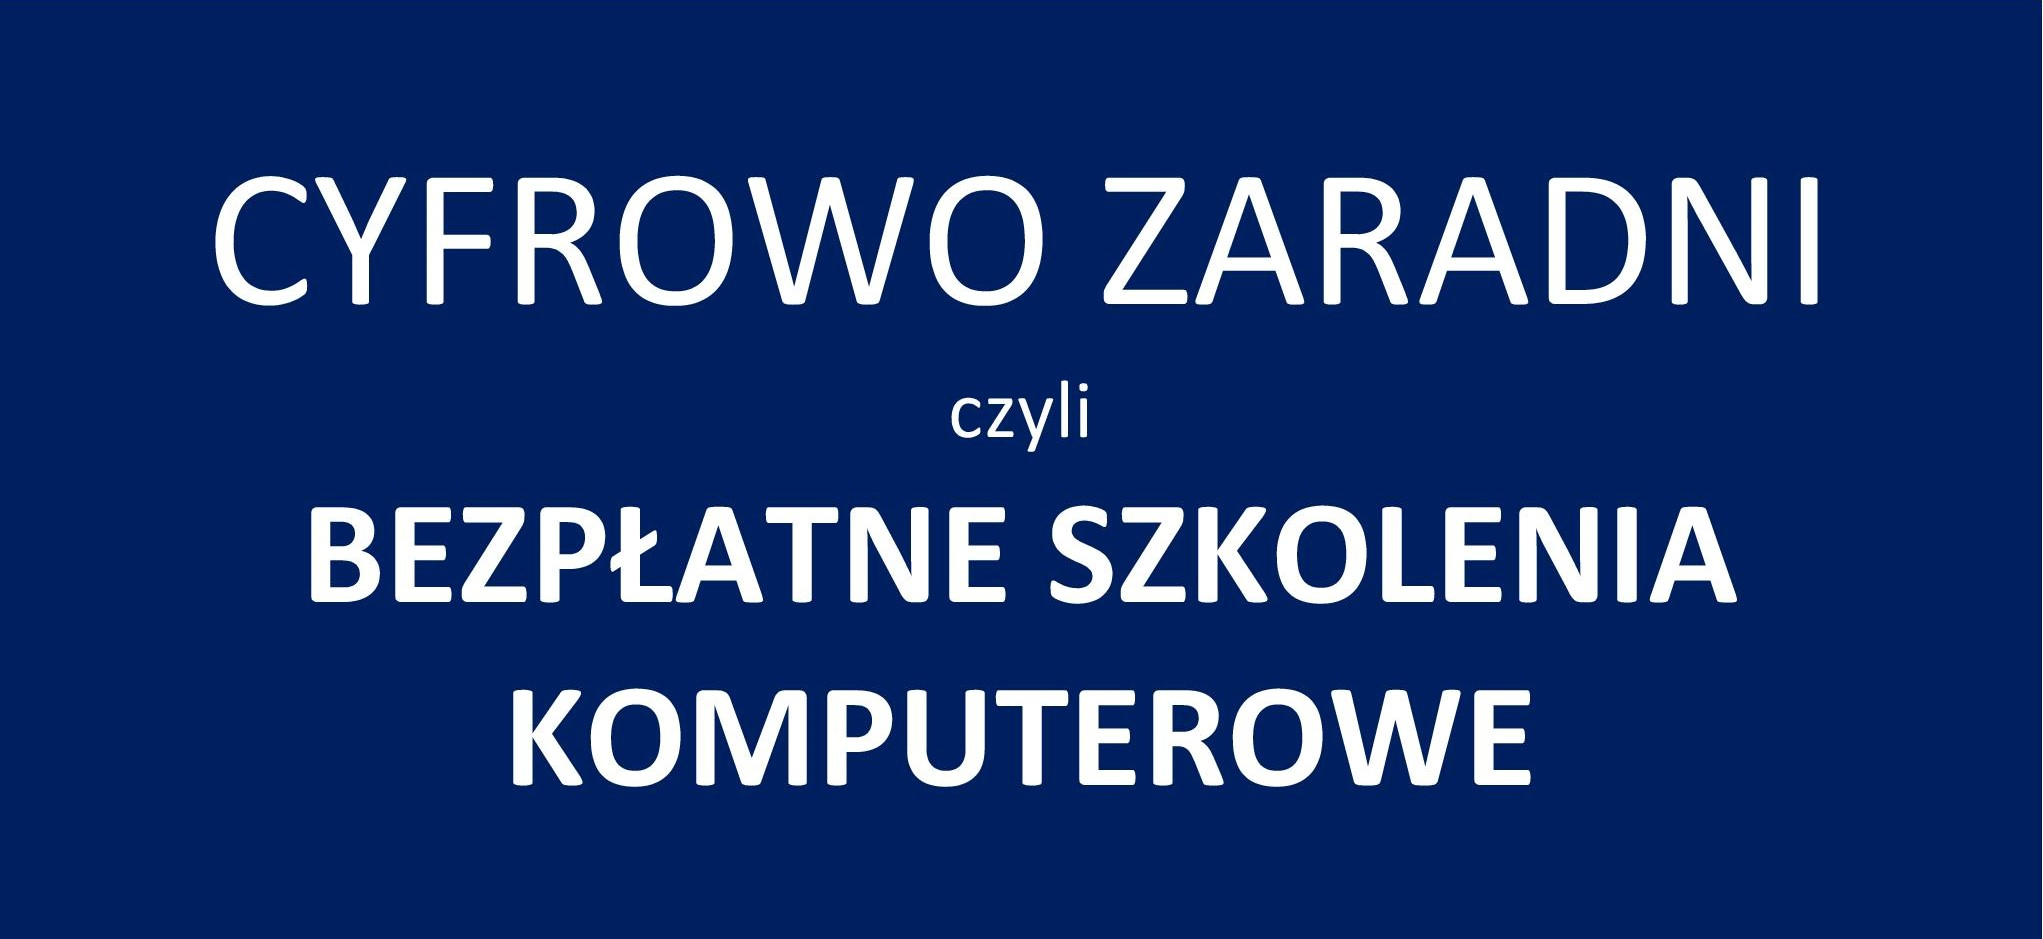 plakat__A3 - obywatel IT — kopia